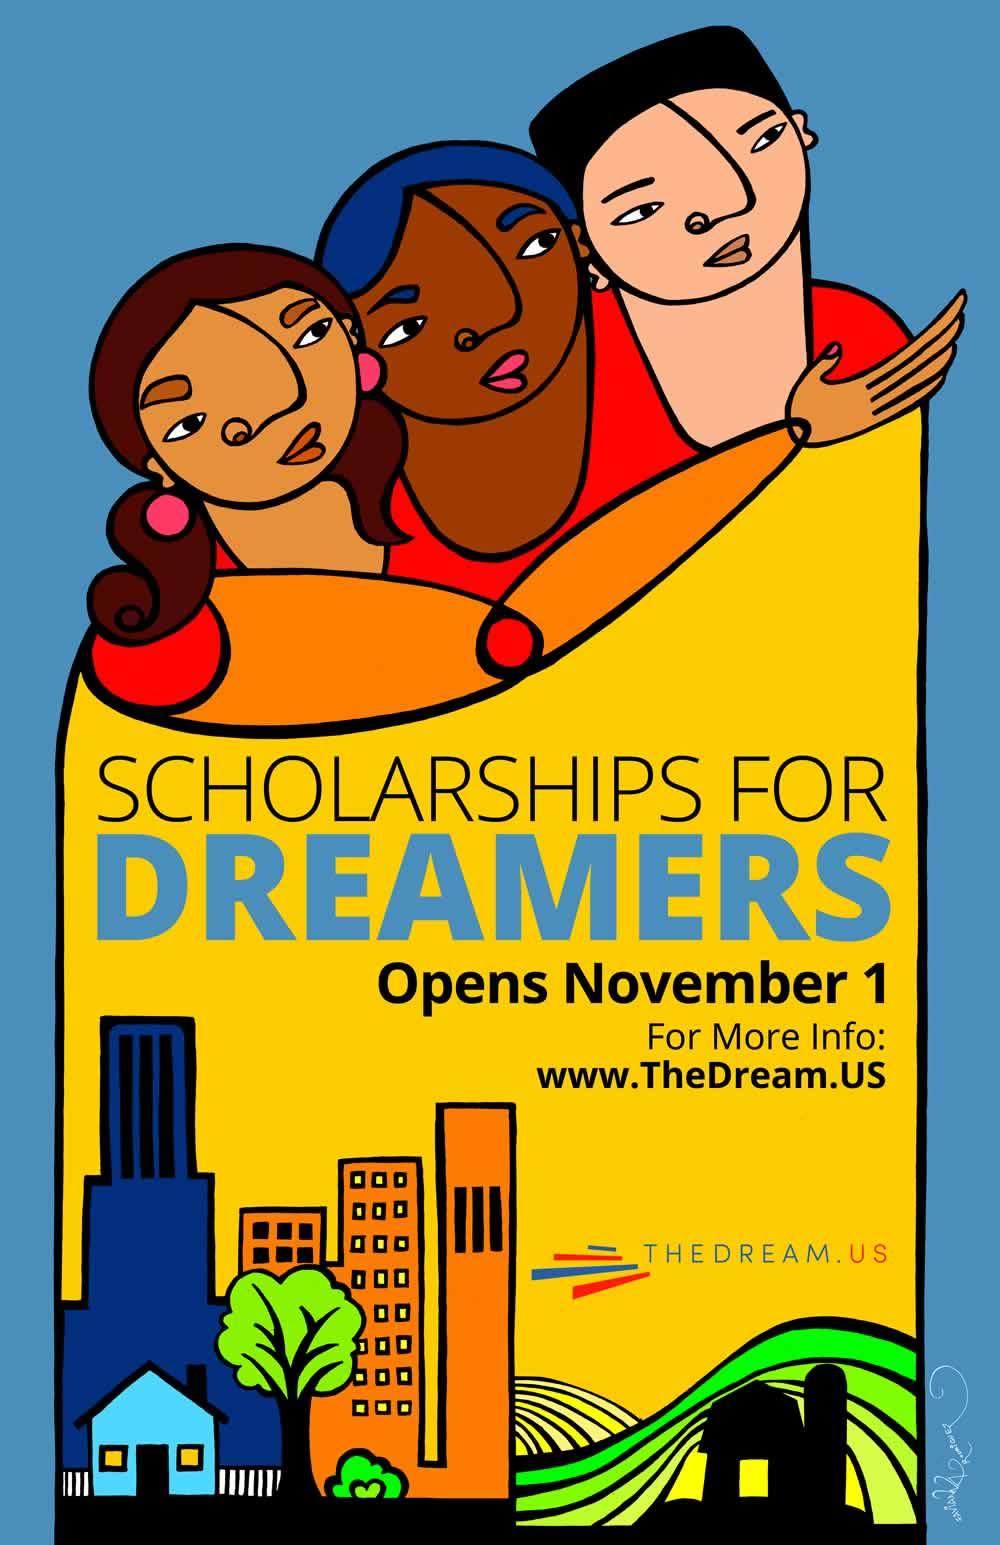 scholarship for dreamers